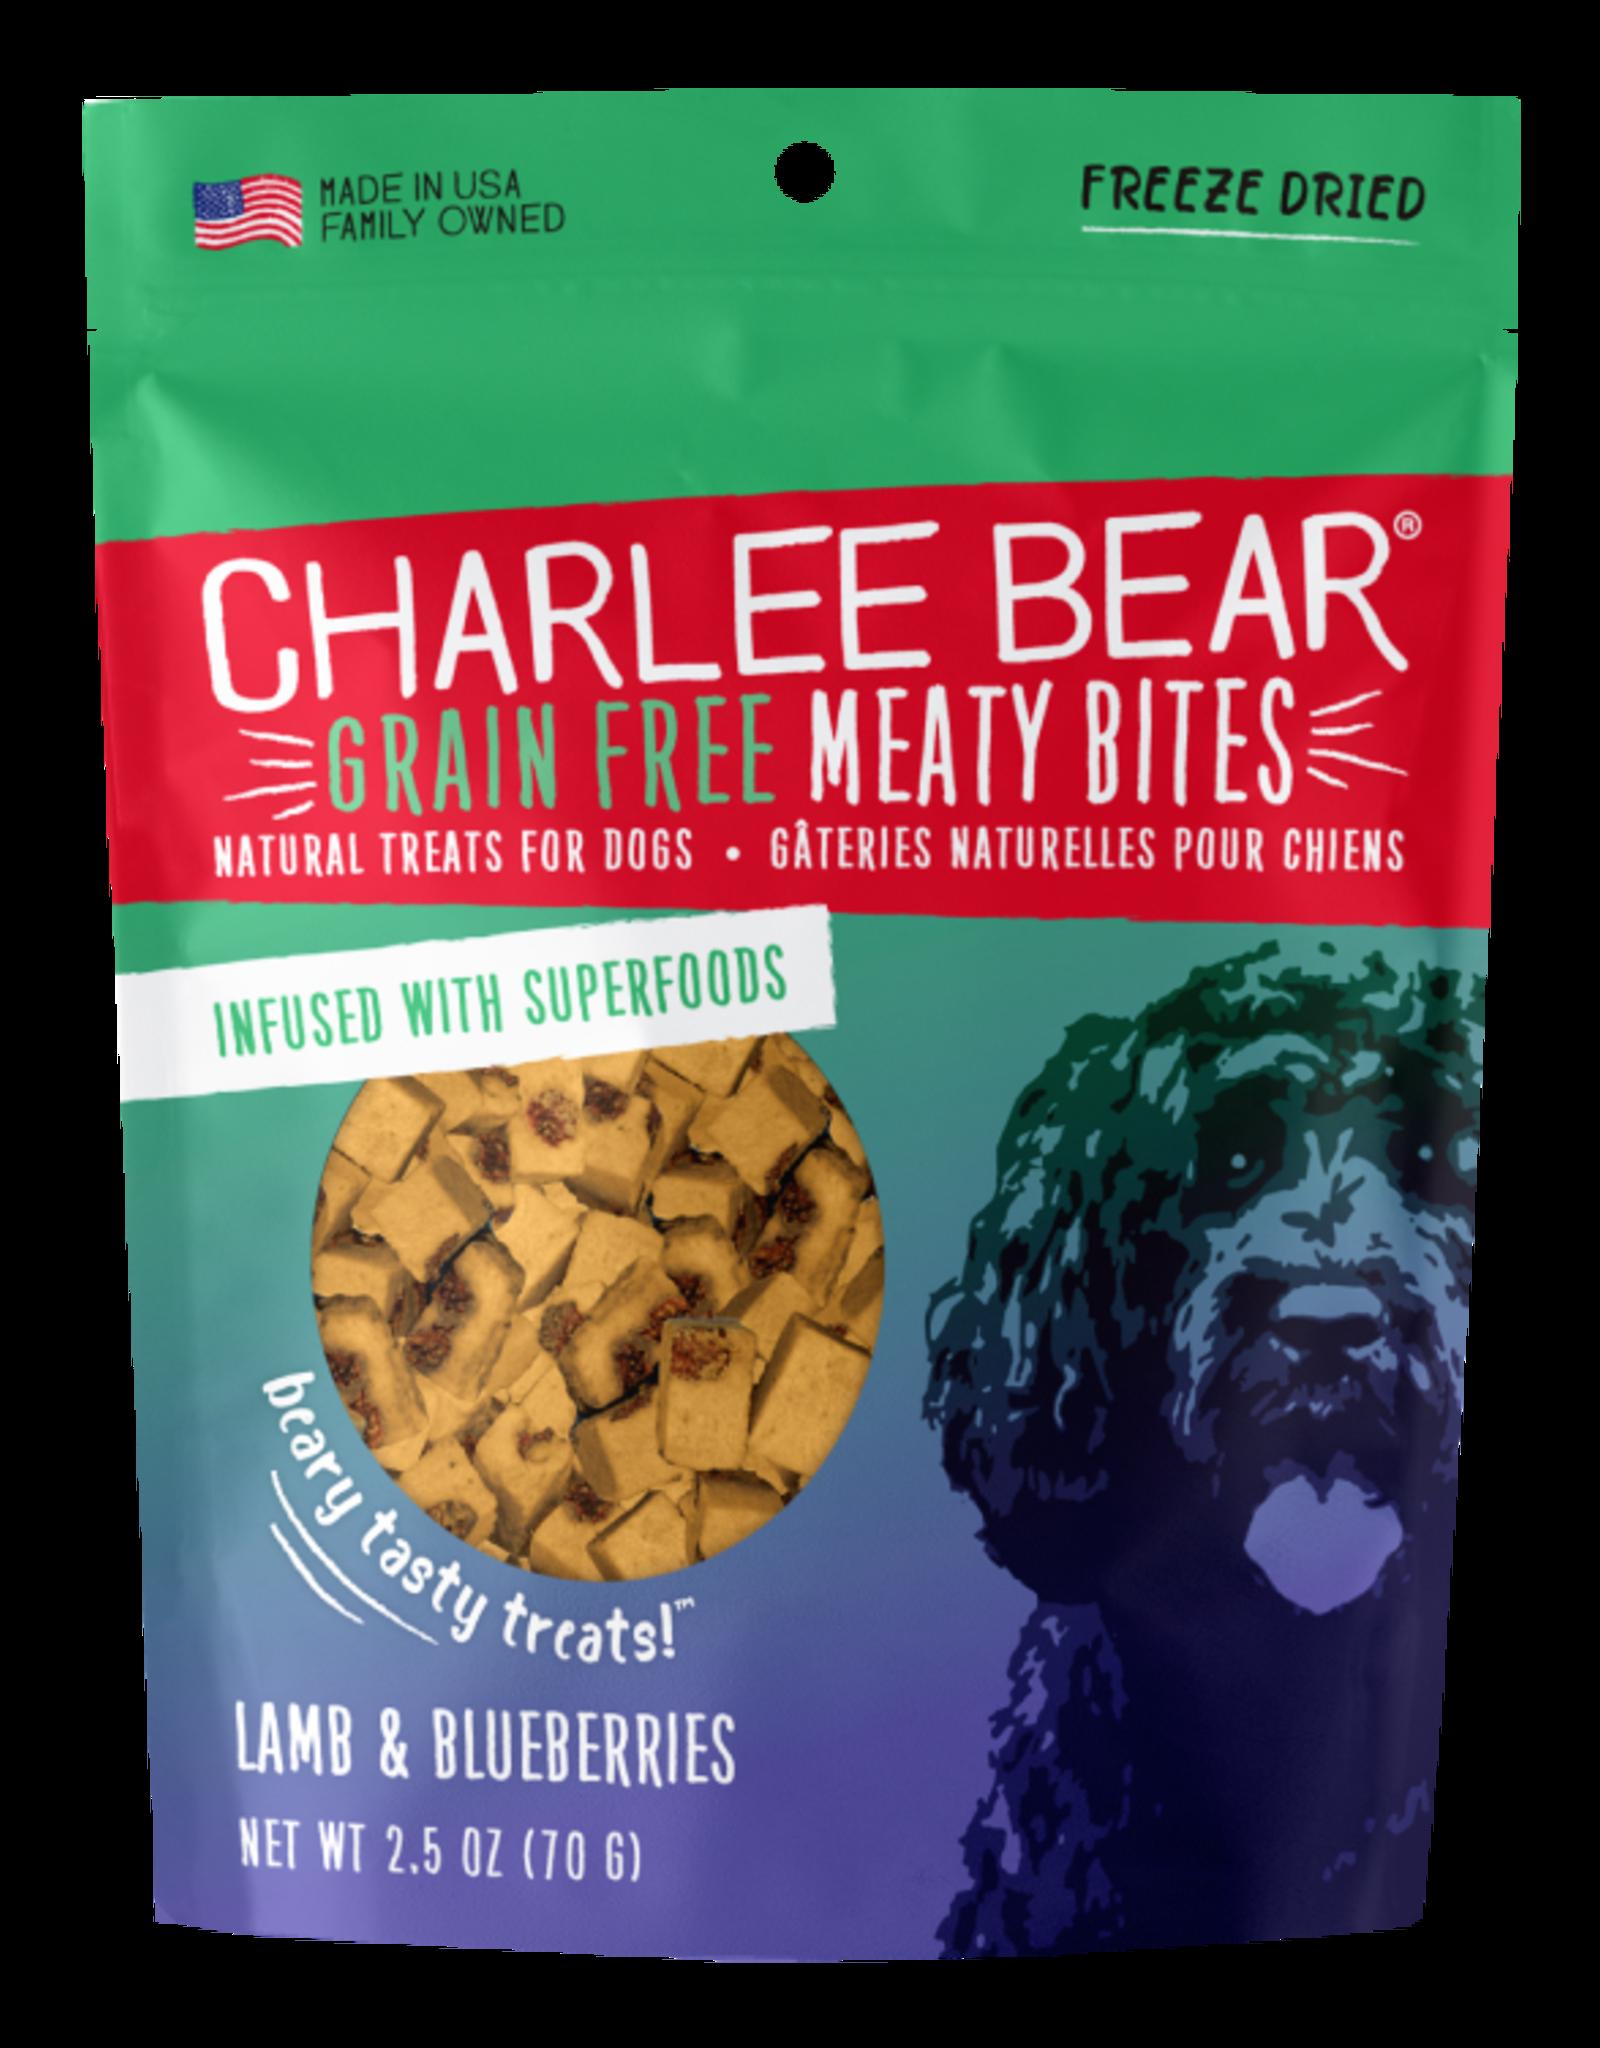 Charlee Bear Meaty Bites Lamb & Blueberries